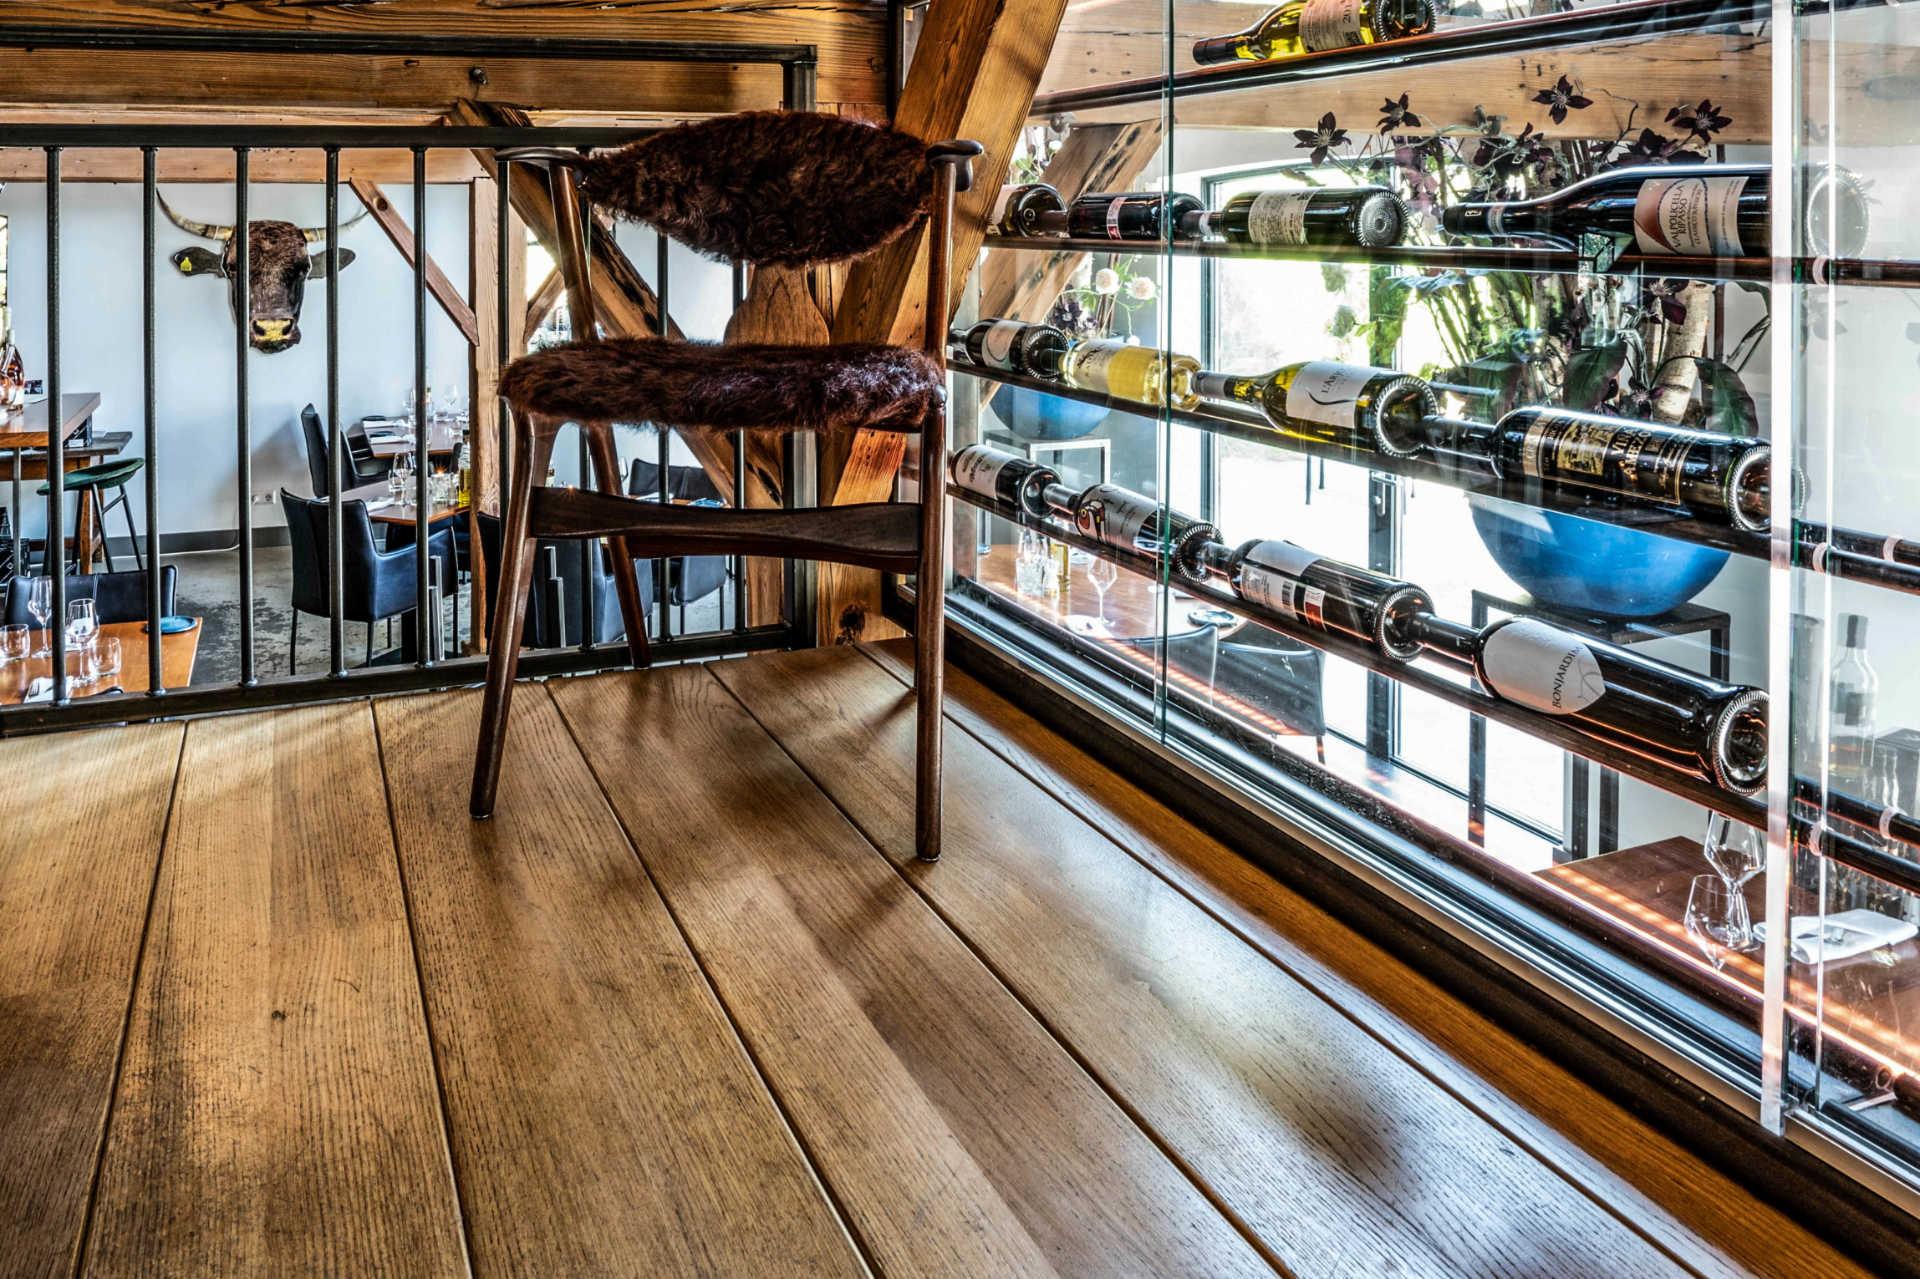 201903 Bavette Maasland Wijnbar wijnproeverij Rotterdam Westland